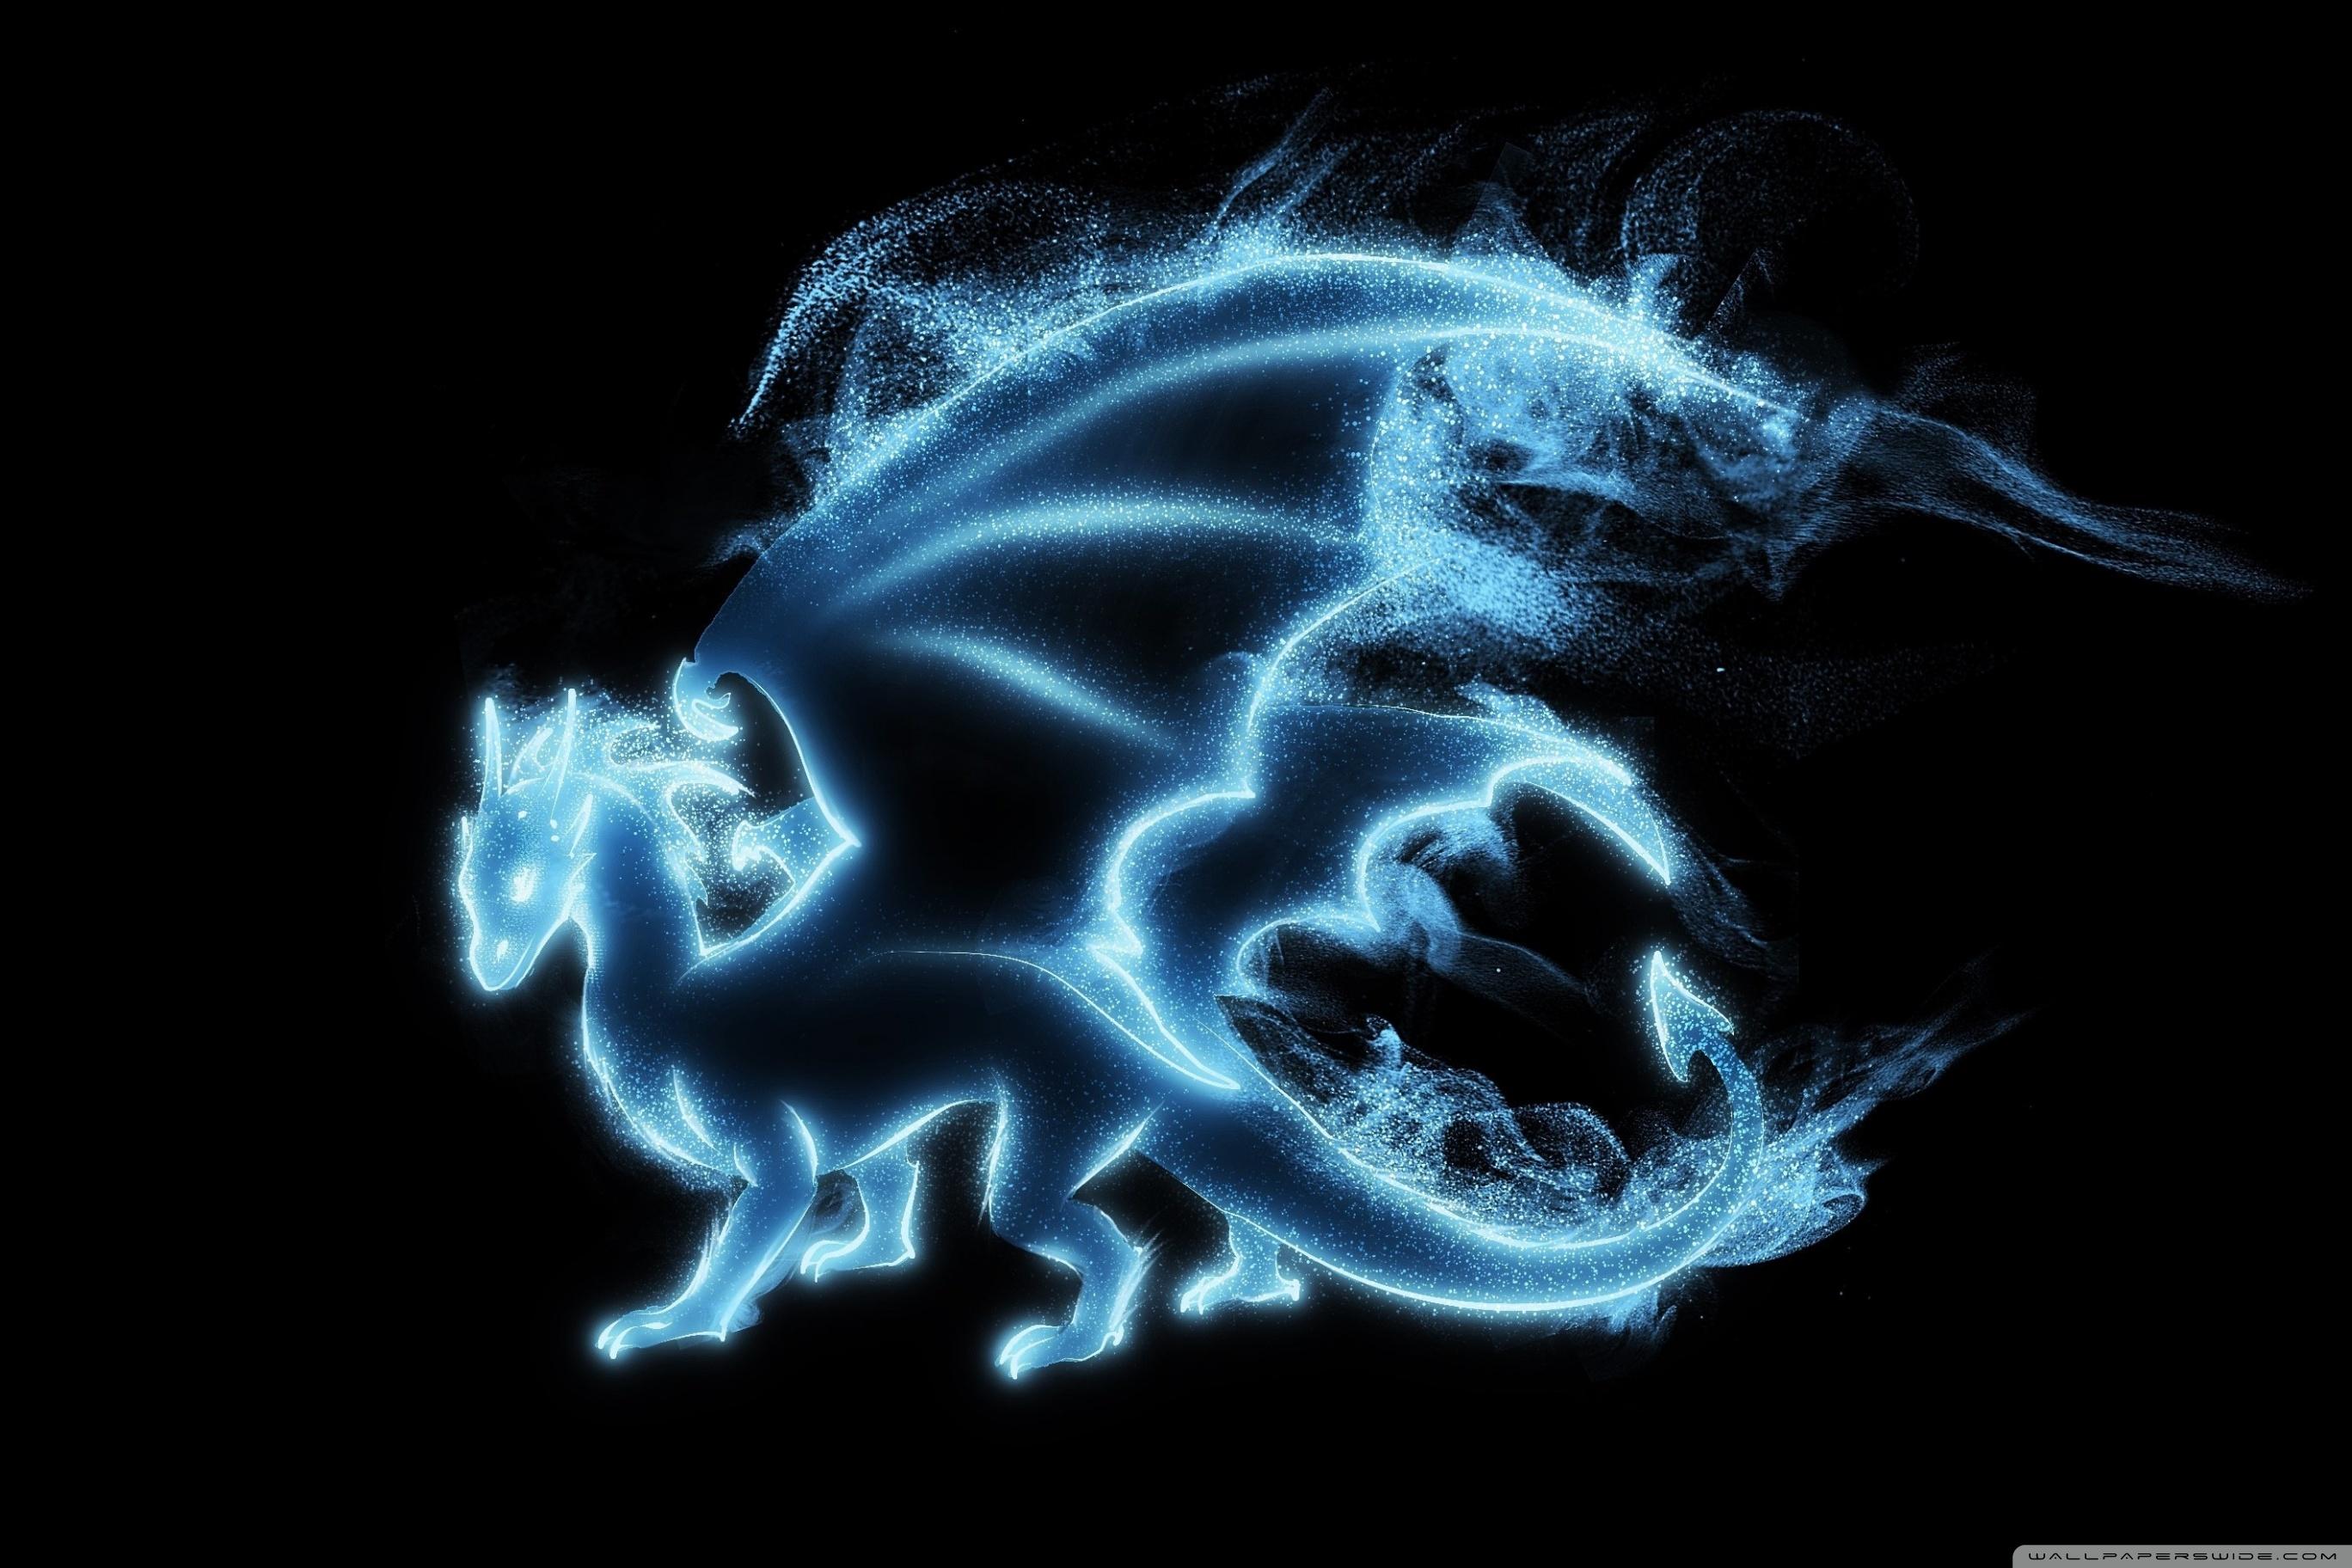 Related Wallpapers - Harry Potter Patronus Drache , HD Wallpaper & Backgrounds